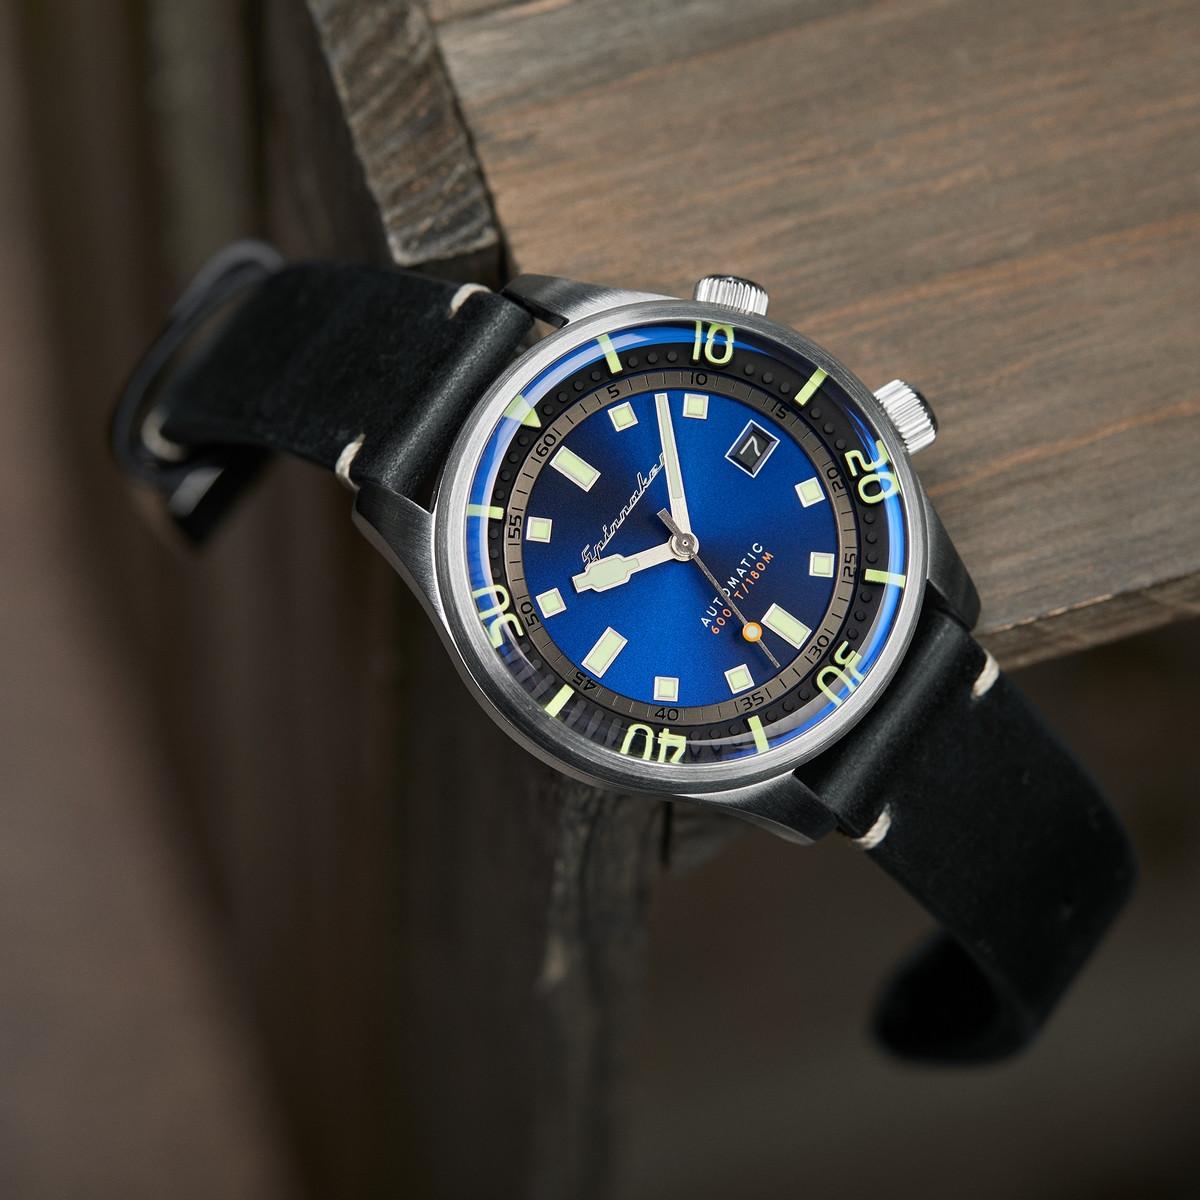 Montre Homme Spinnaker BRADNER Automatique Cadran bleu Bracelet cuir noir